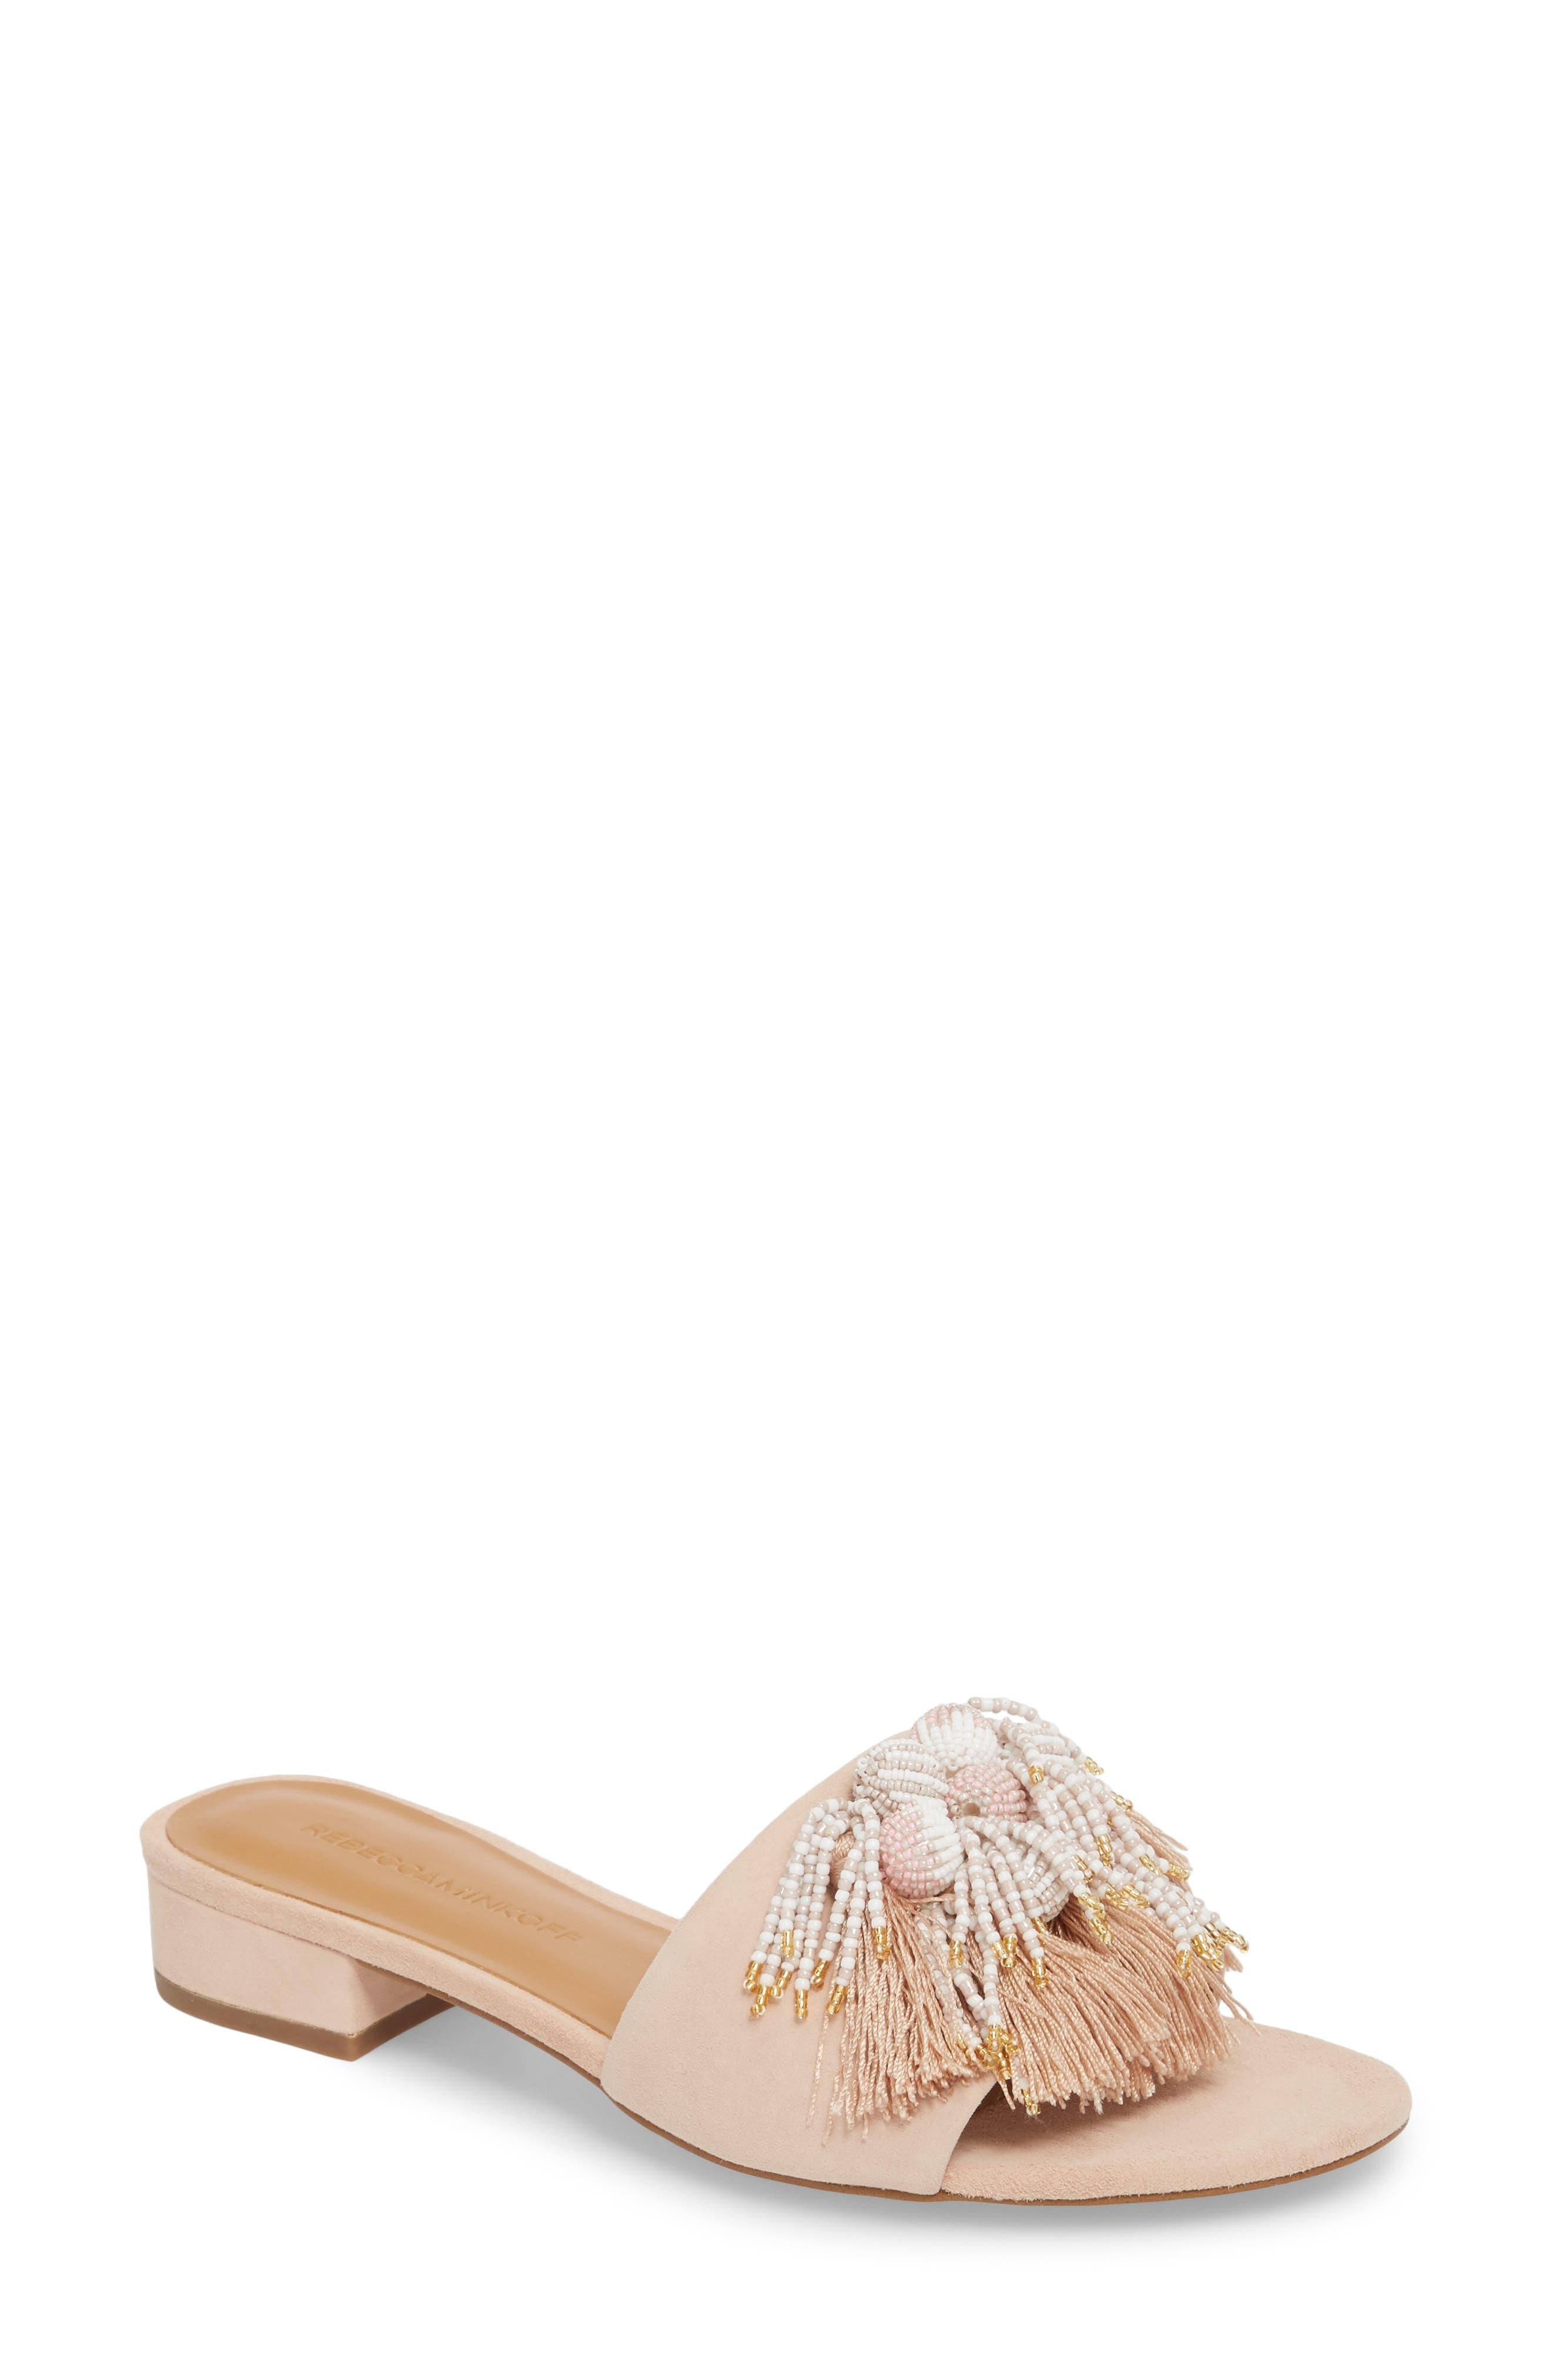 Rebecca Minkoff Kayleigh Embellished Slide Sandal (Women)